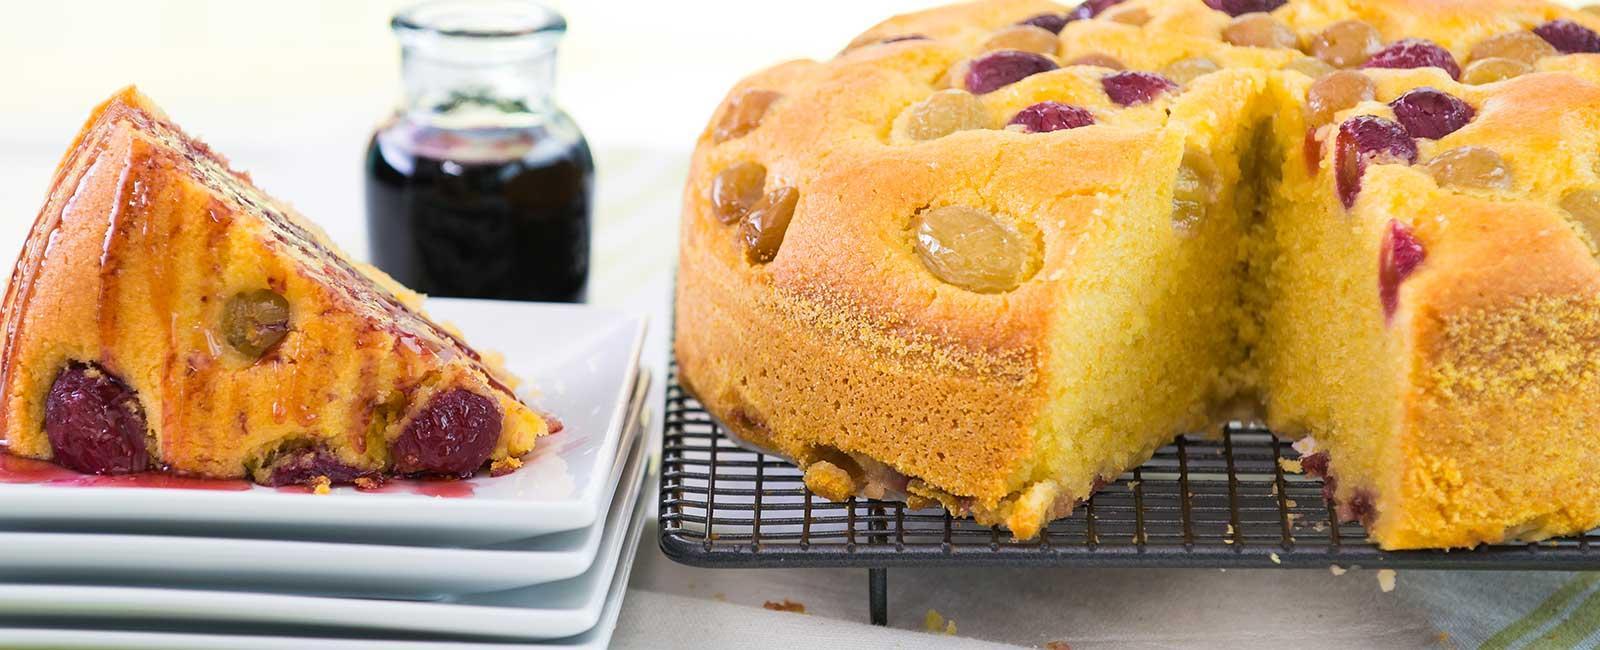 Golden Grape Cake with Grape Juice Reduction